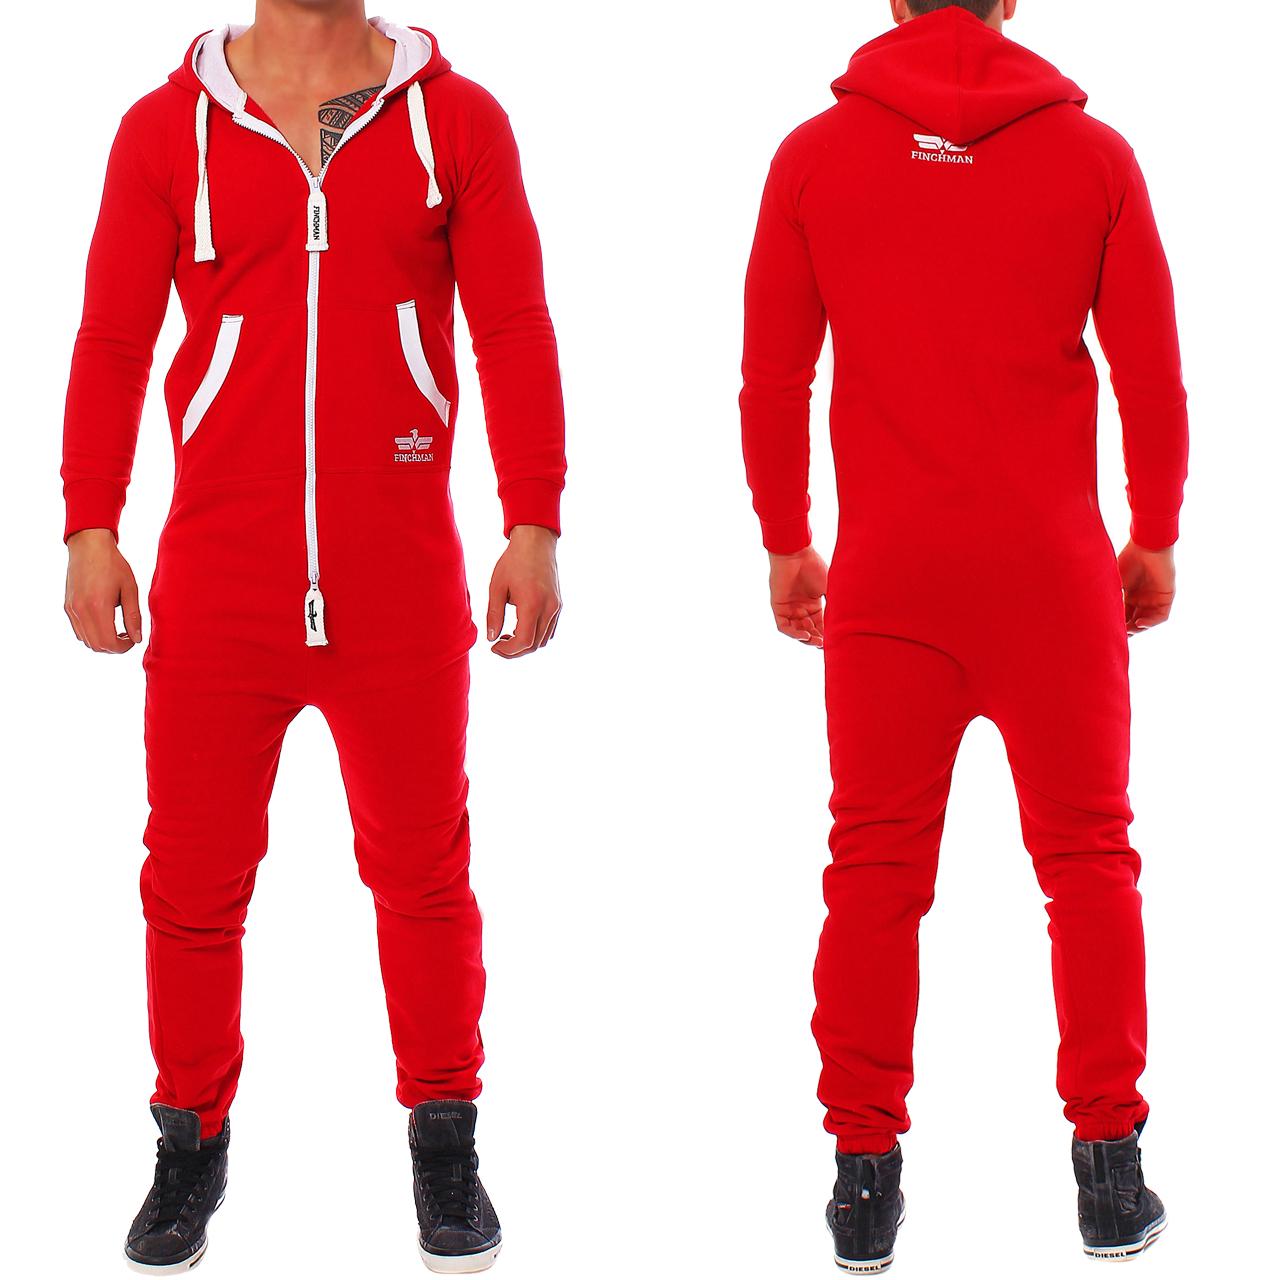 finchman homme combinaison jogger jogging costume. Black Bedroom Furniture Sets. Home Design Ideas